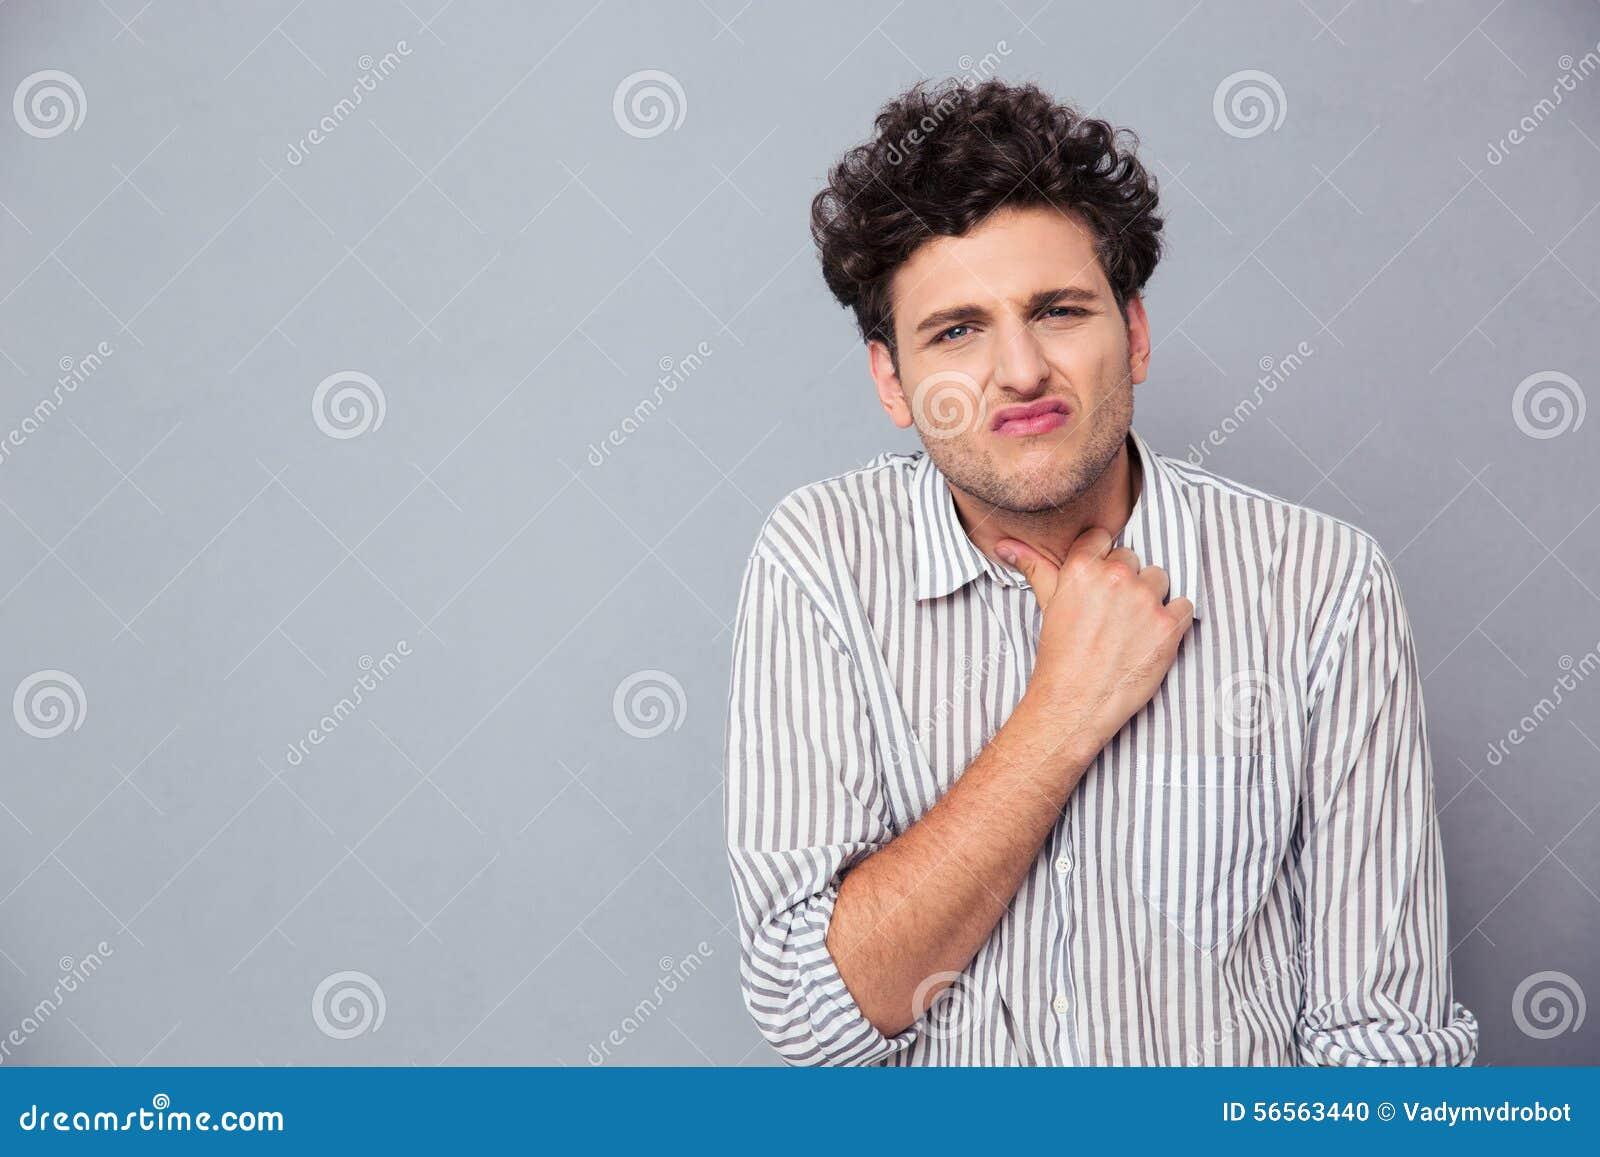 Download Περιστασιακό άτομο που έχει τον πόνο λαιμών Στοκ Εικόνες - εικόνα από όμορφος, κεφάλι: 56563440